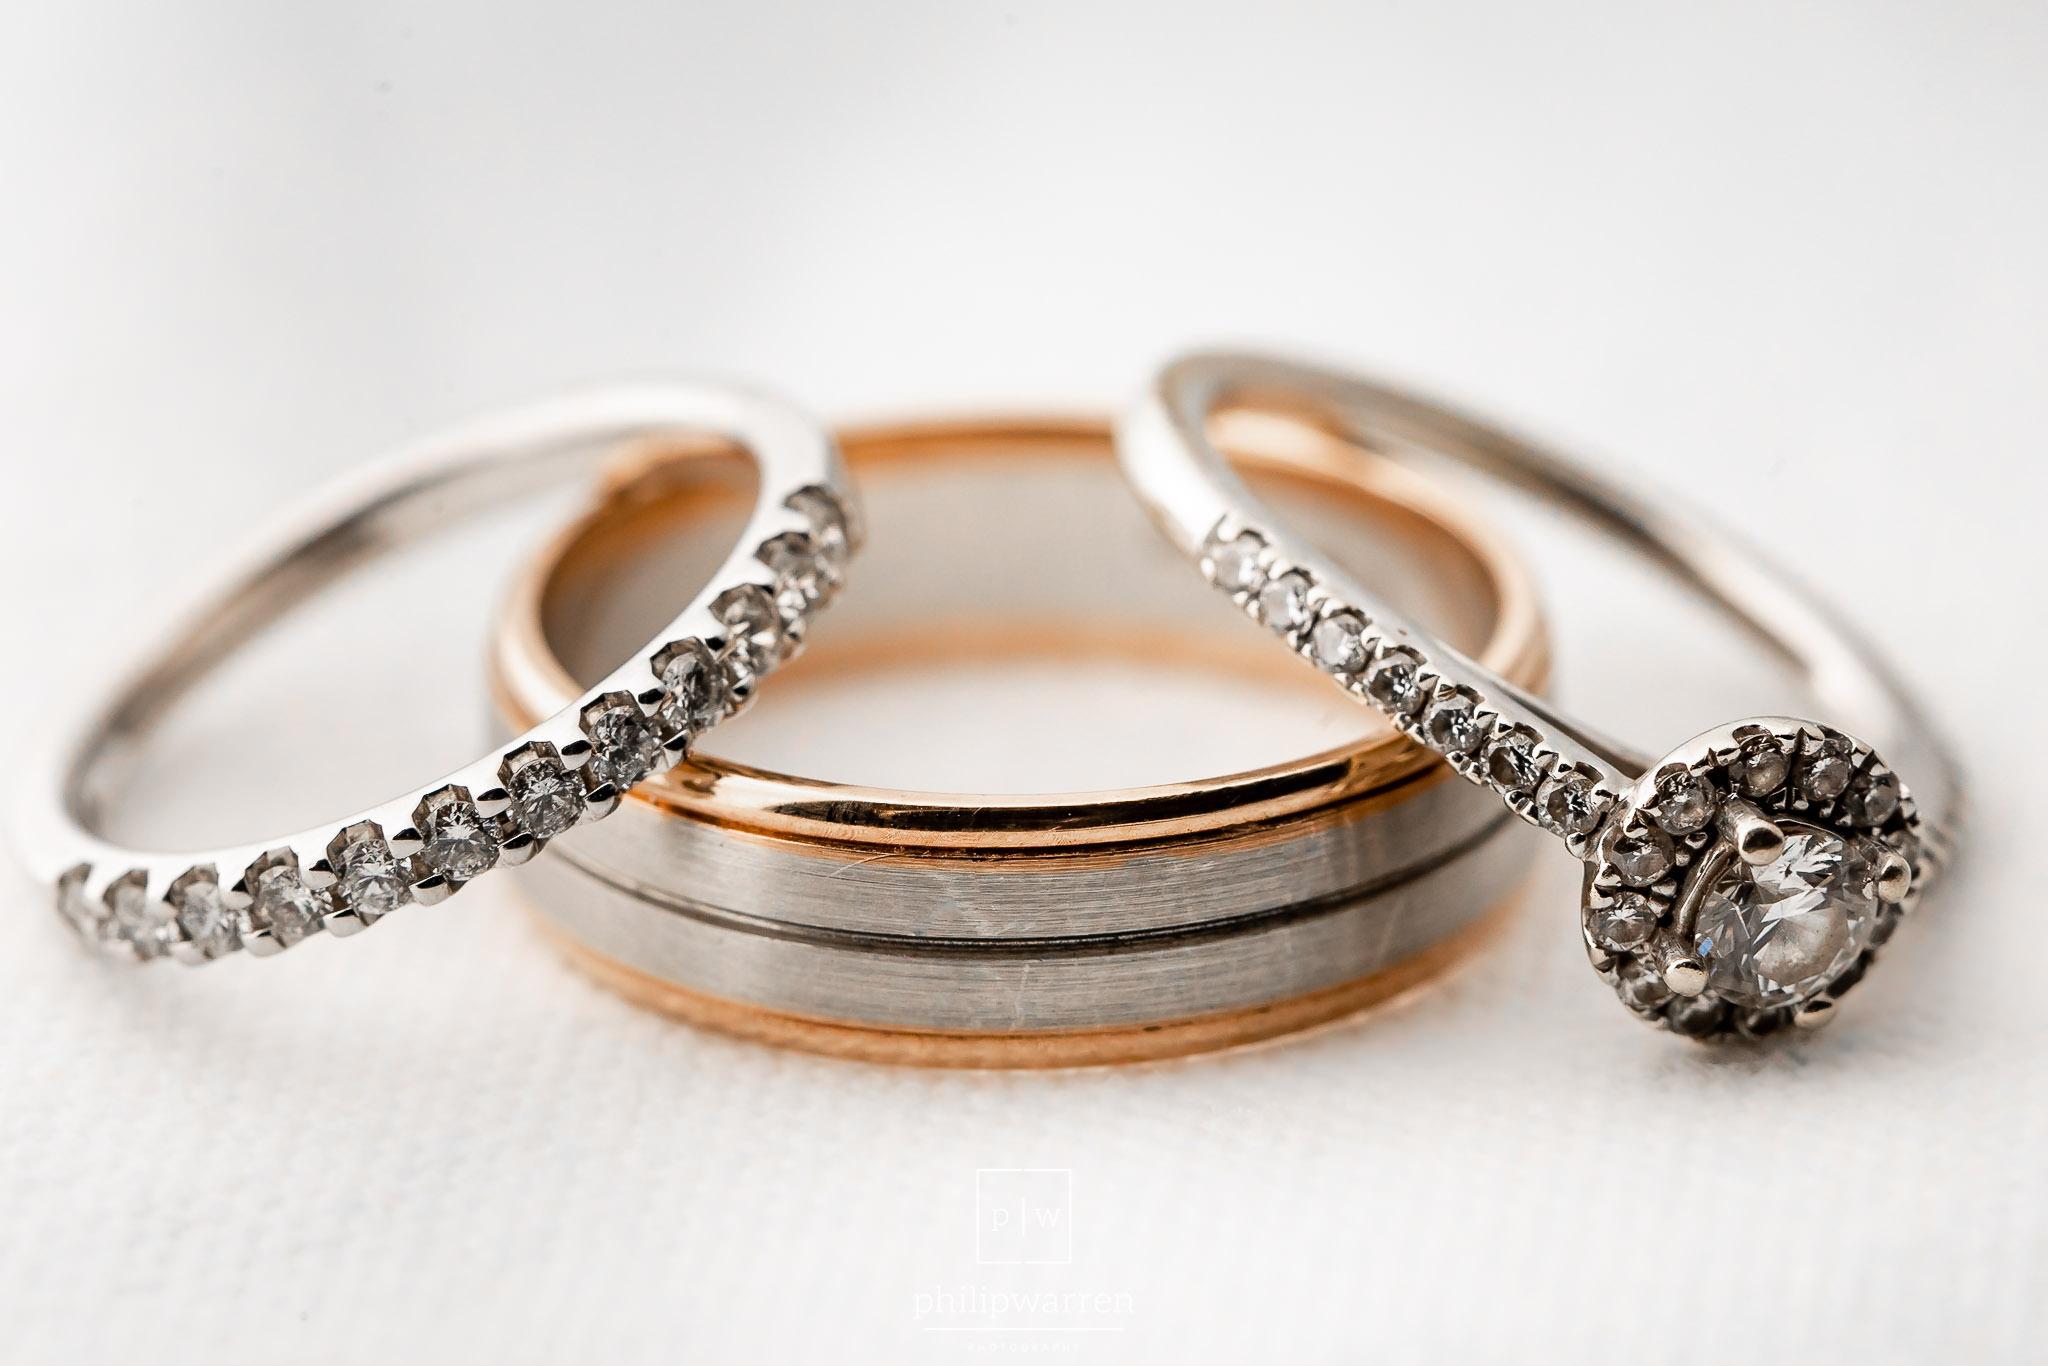 macro phot of the wedding rings